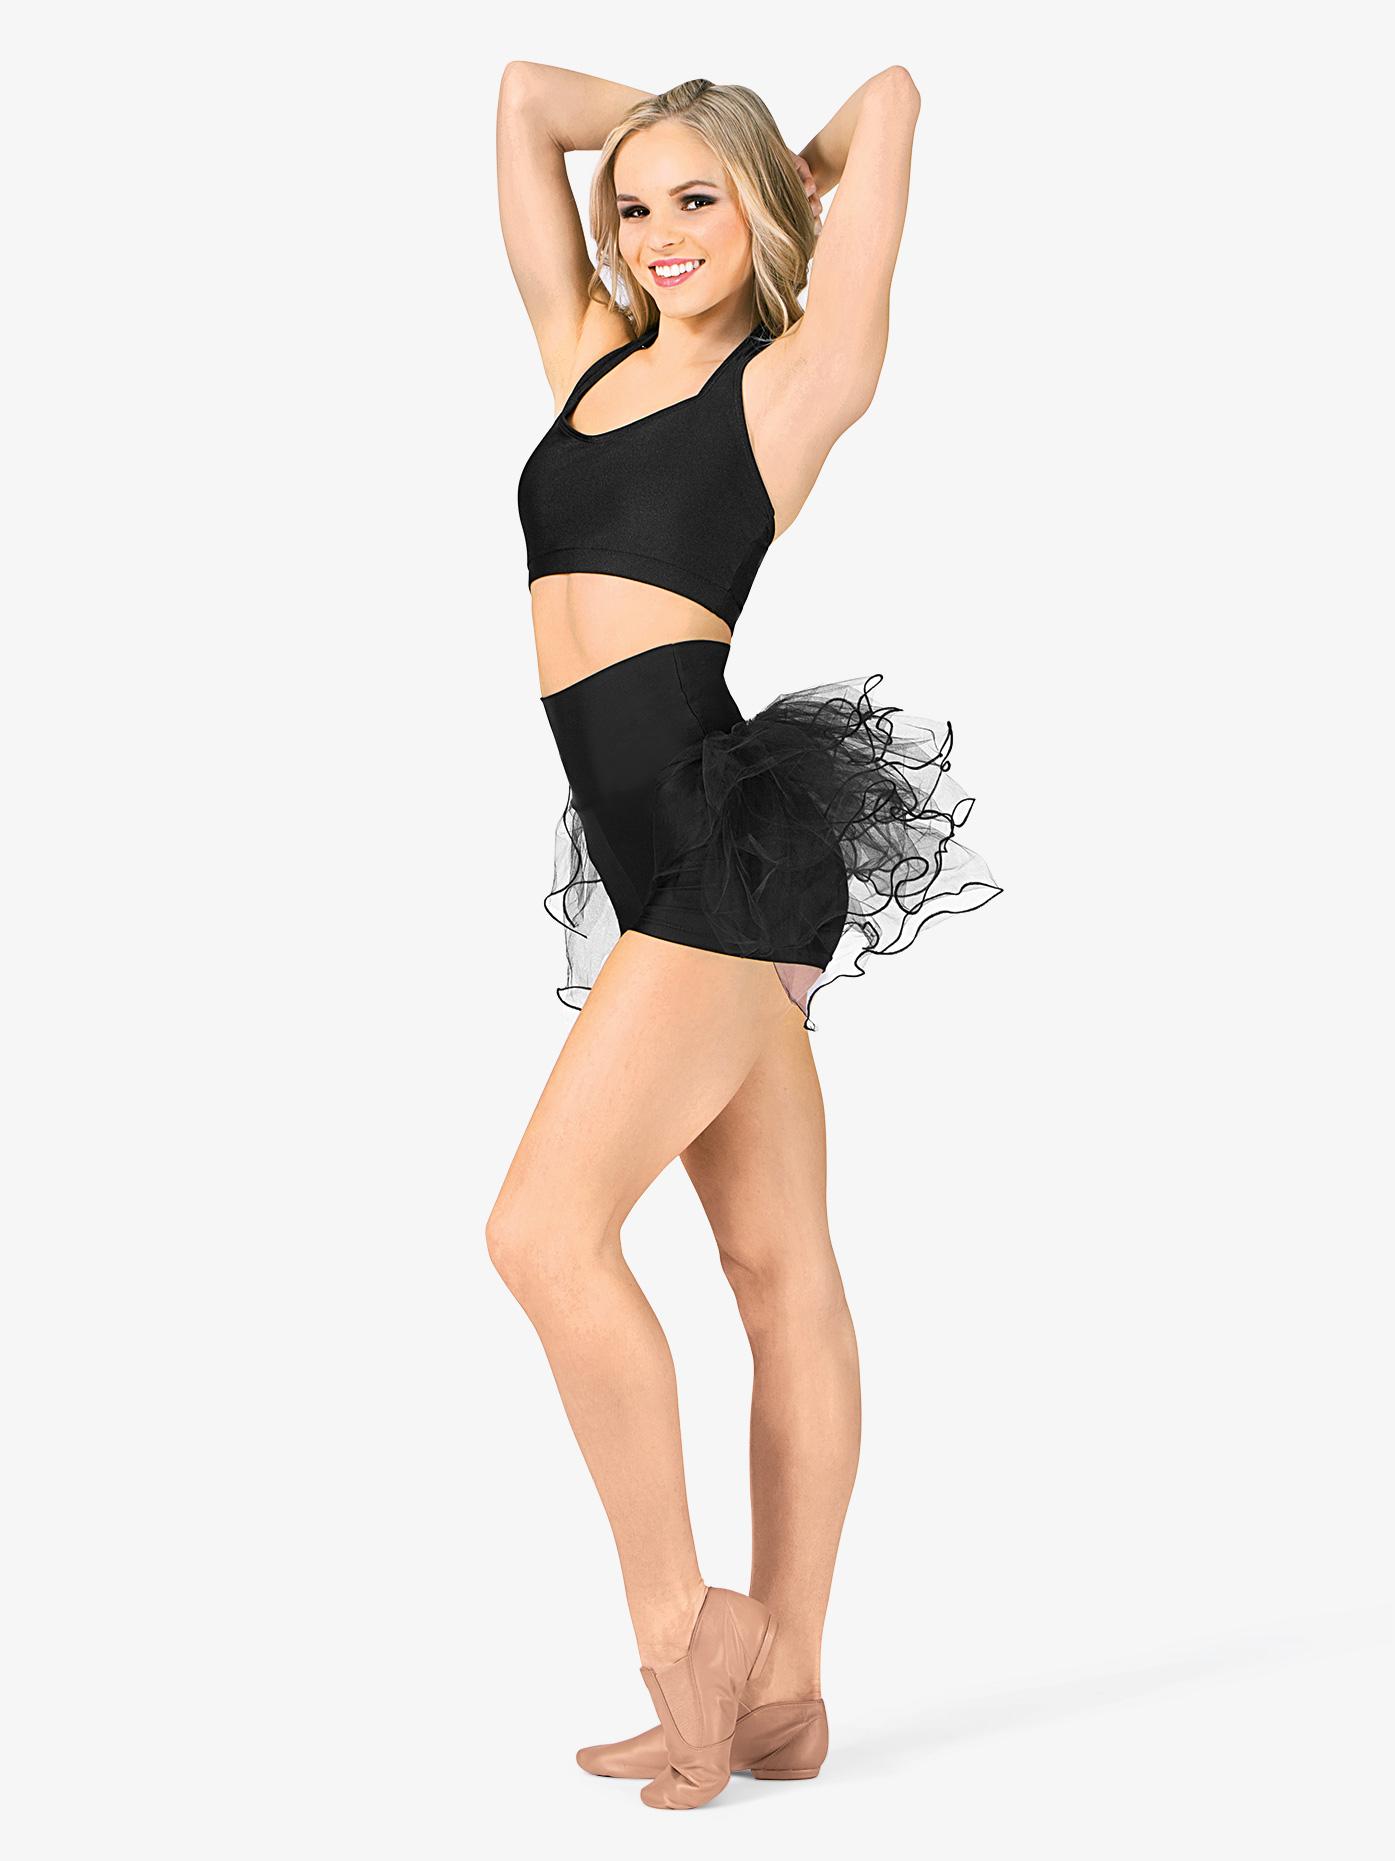 Double Platinum Adult High Waist Bustle Dance Shorts N7125